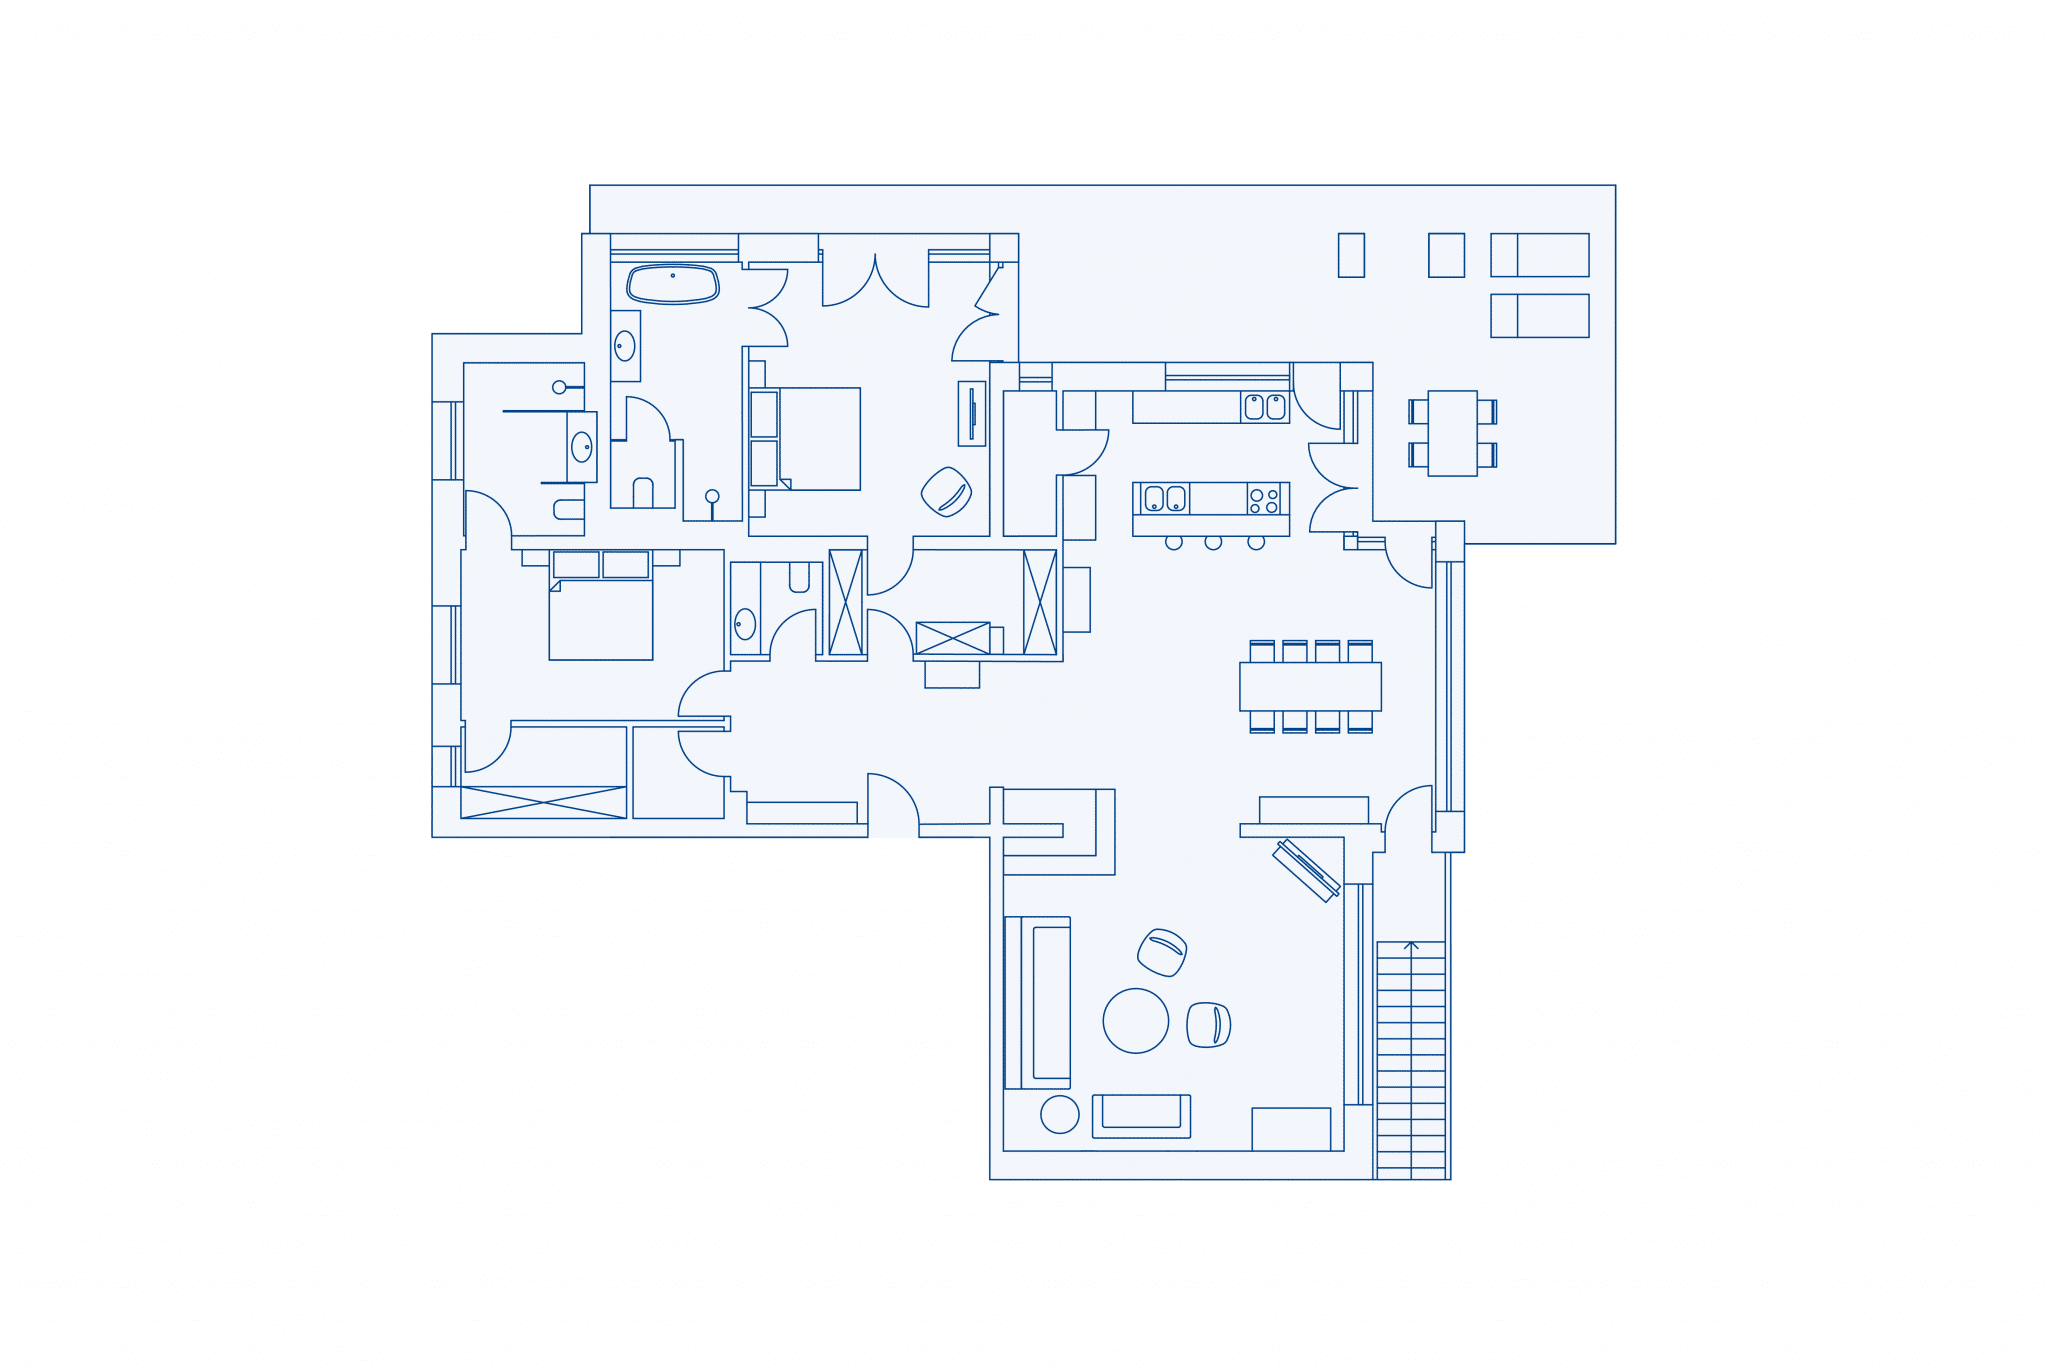 Room layout park residence 160 at VIVAMAYR Altaussee